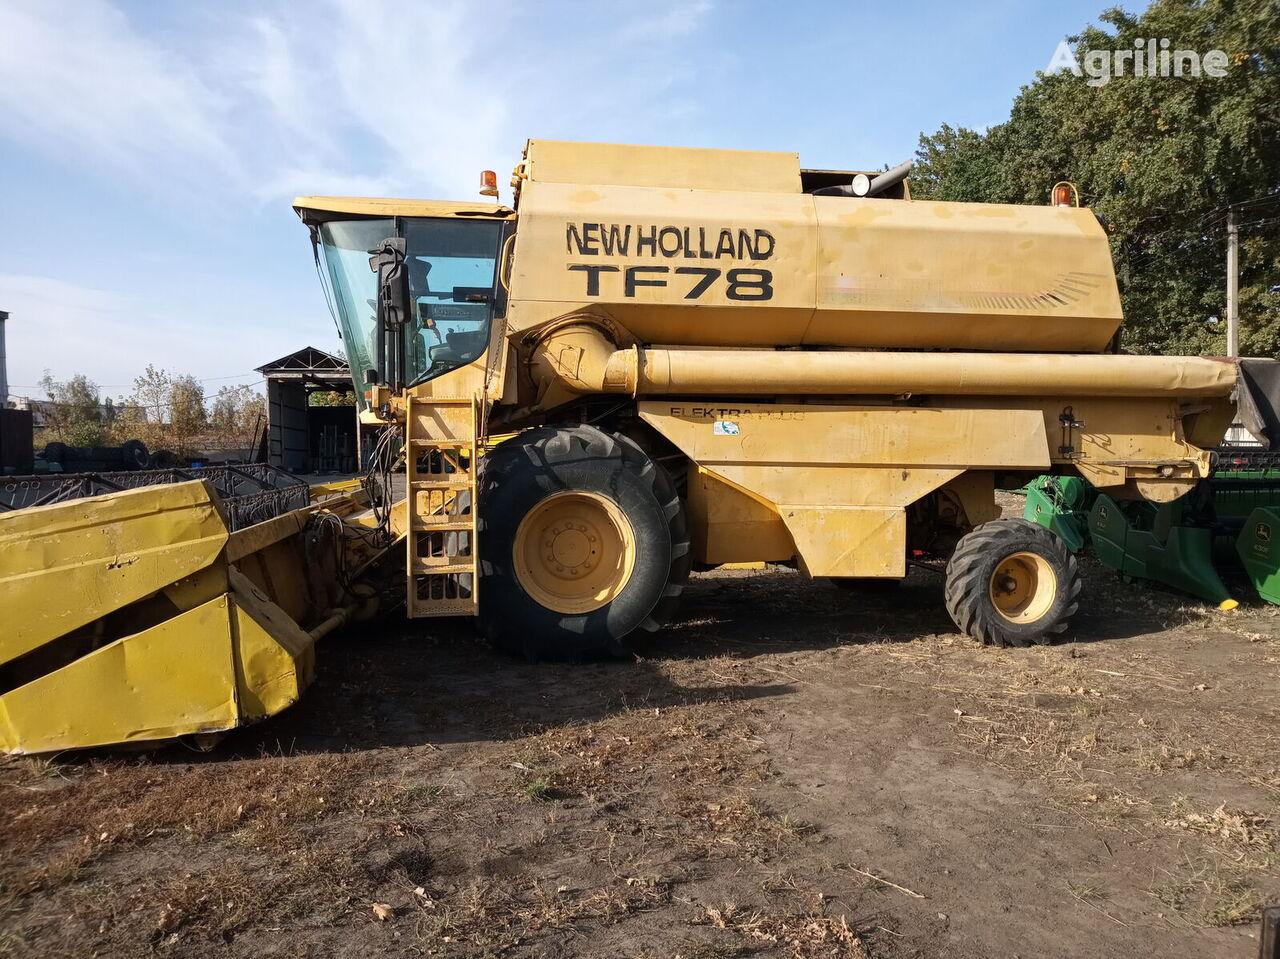 NEW HOLLAND TF 78 grain harvester